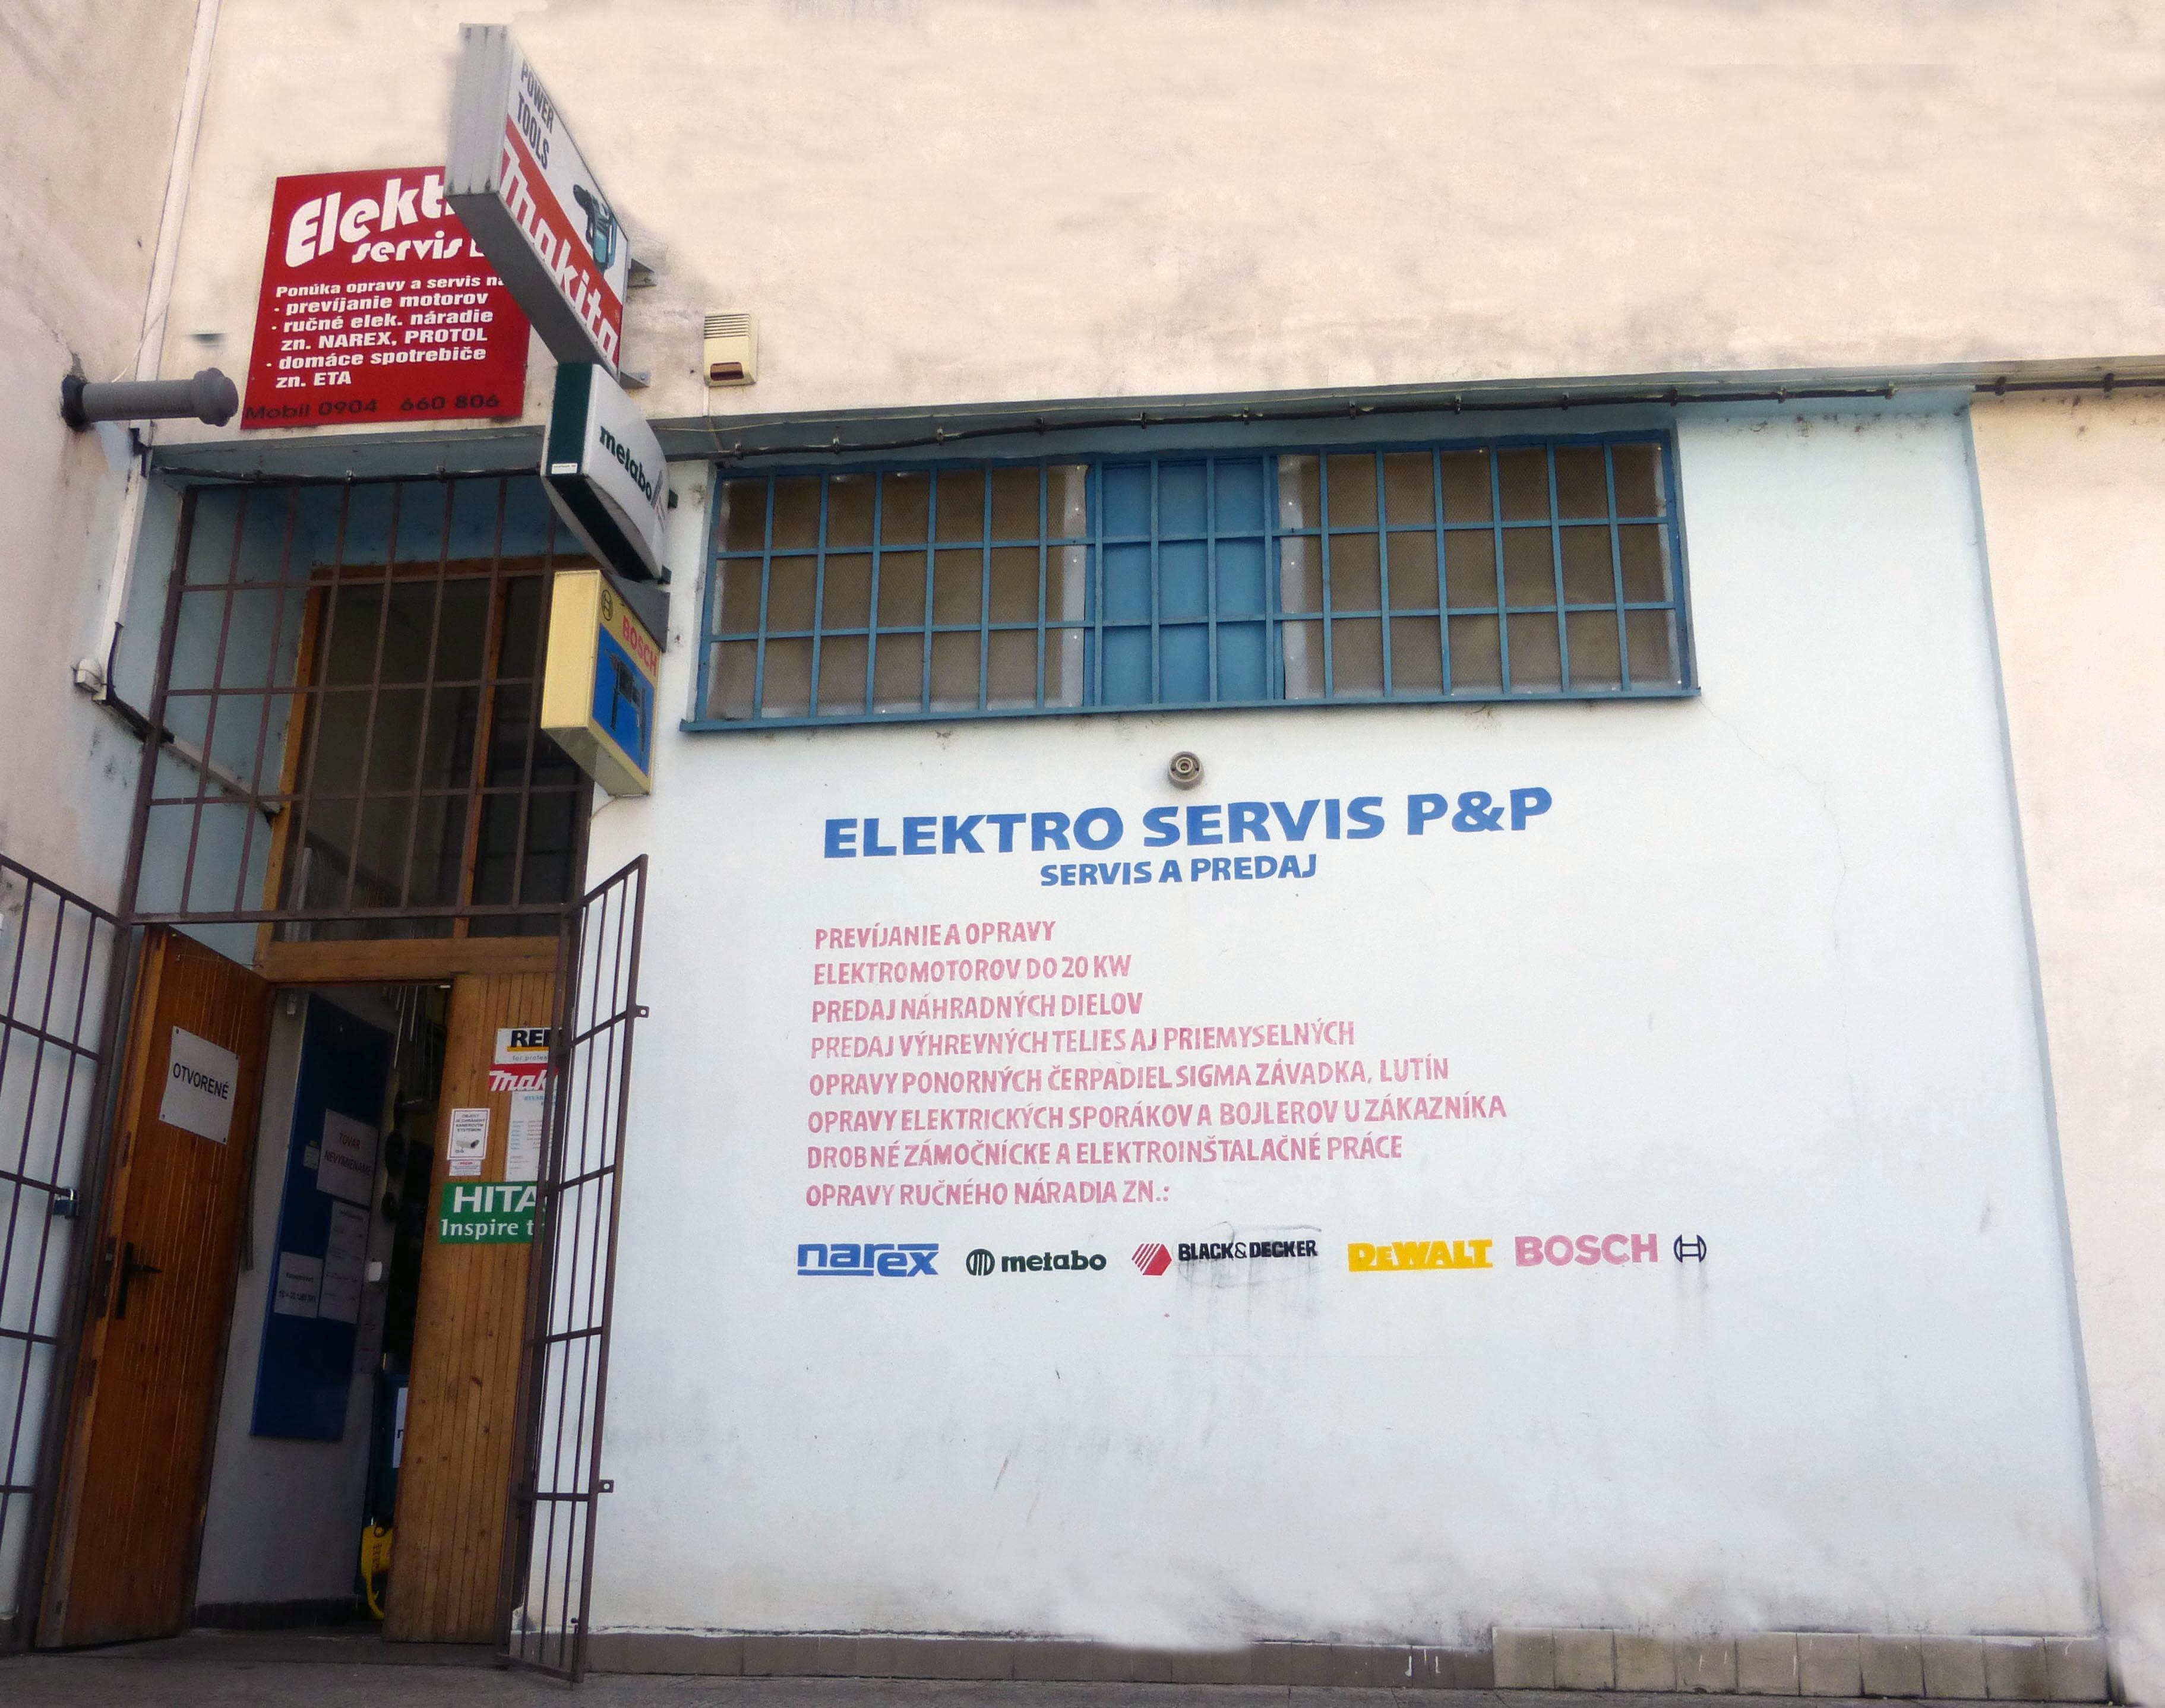 Elektroservis P&P